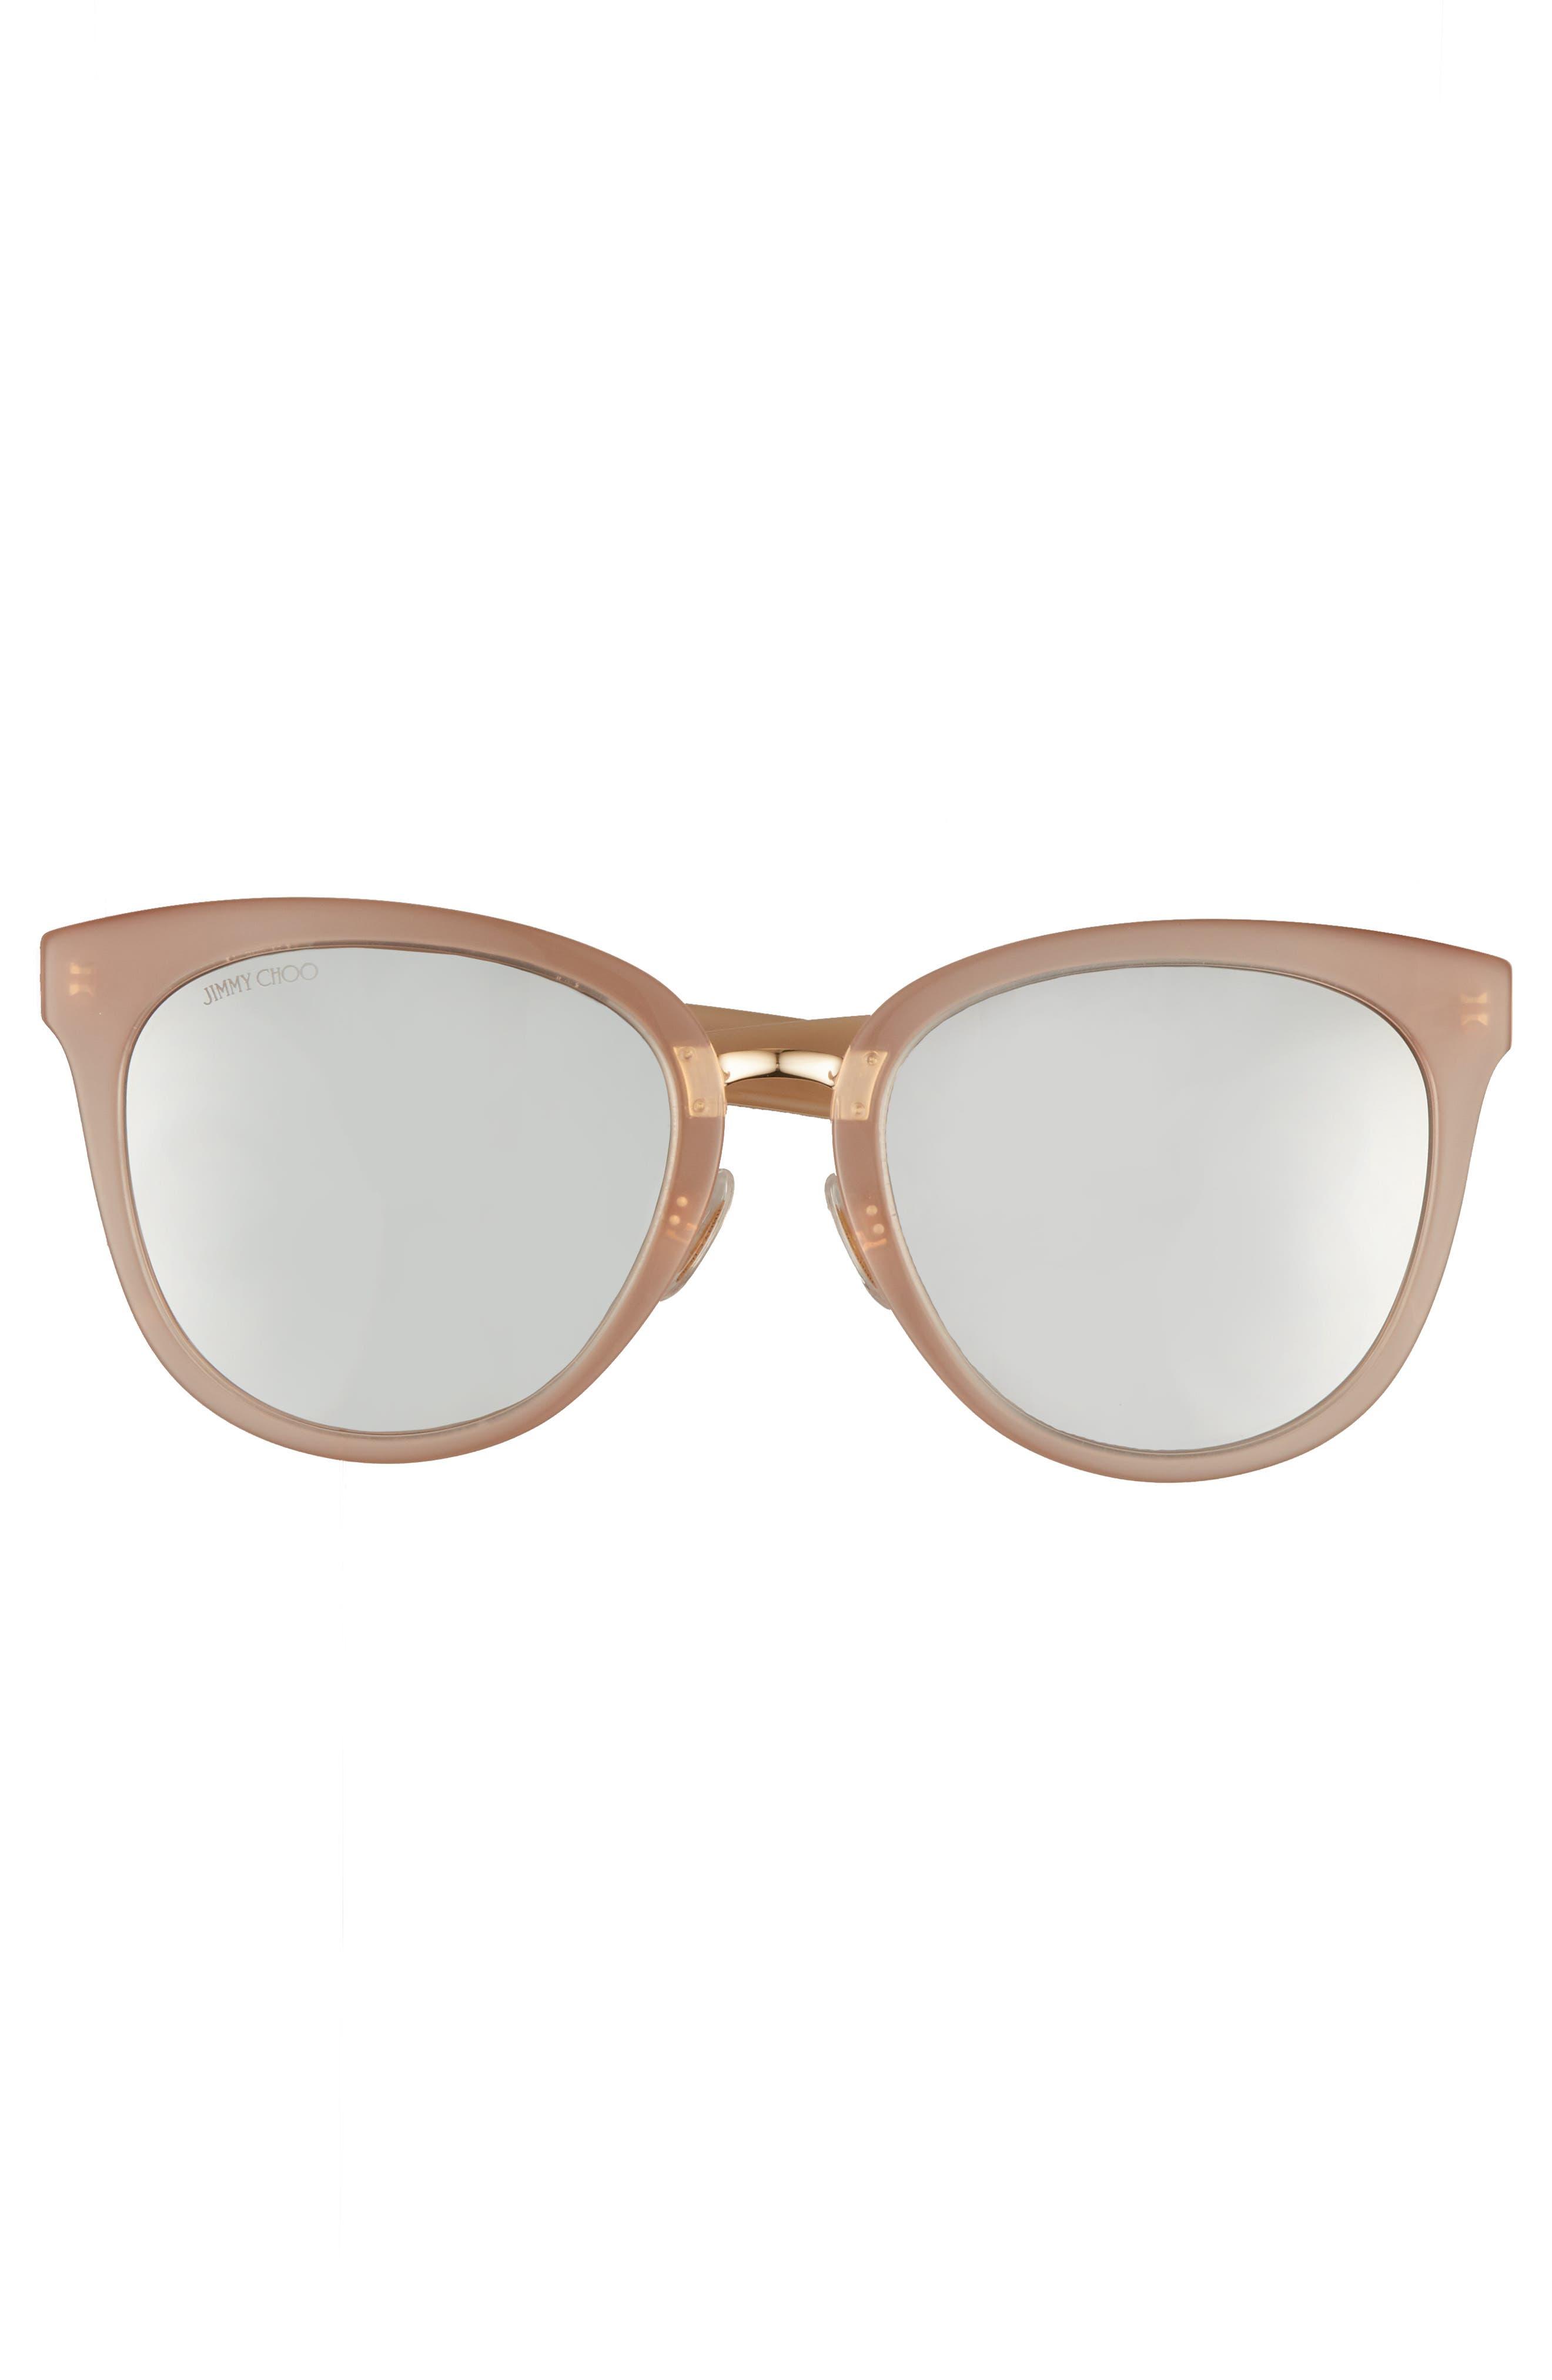 Cadefs 55mm Sunglasses,                             Alternate thumbnail 3, color,                             Nude Glitter Nude